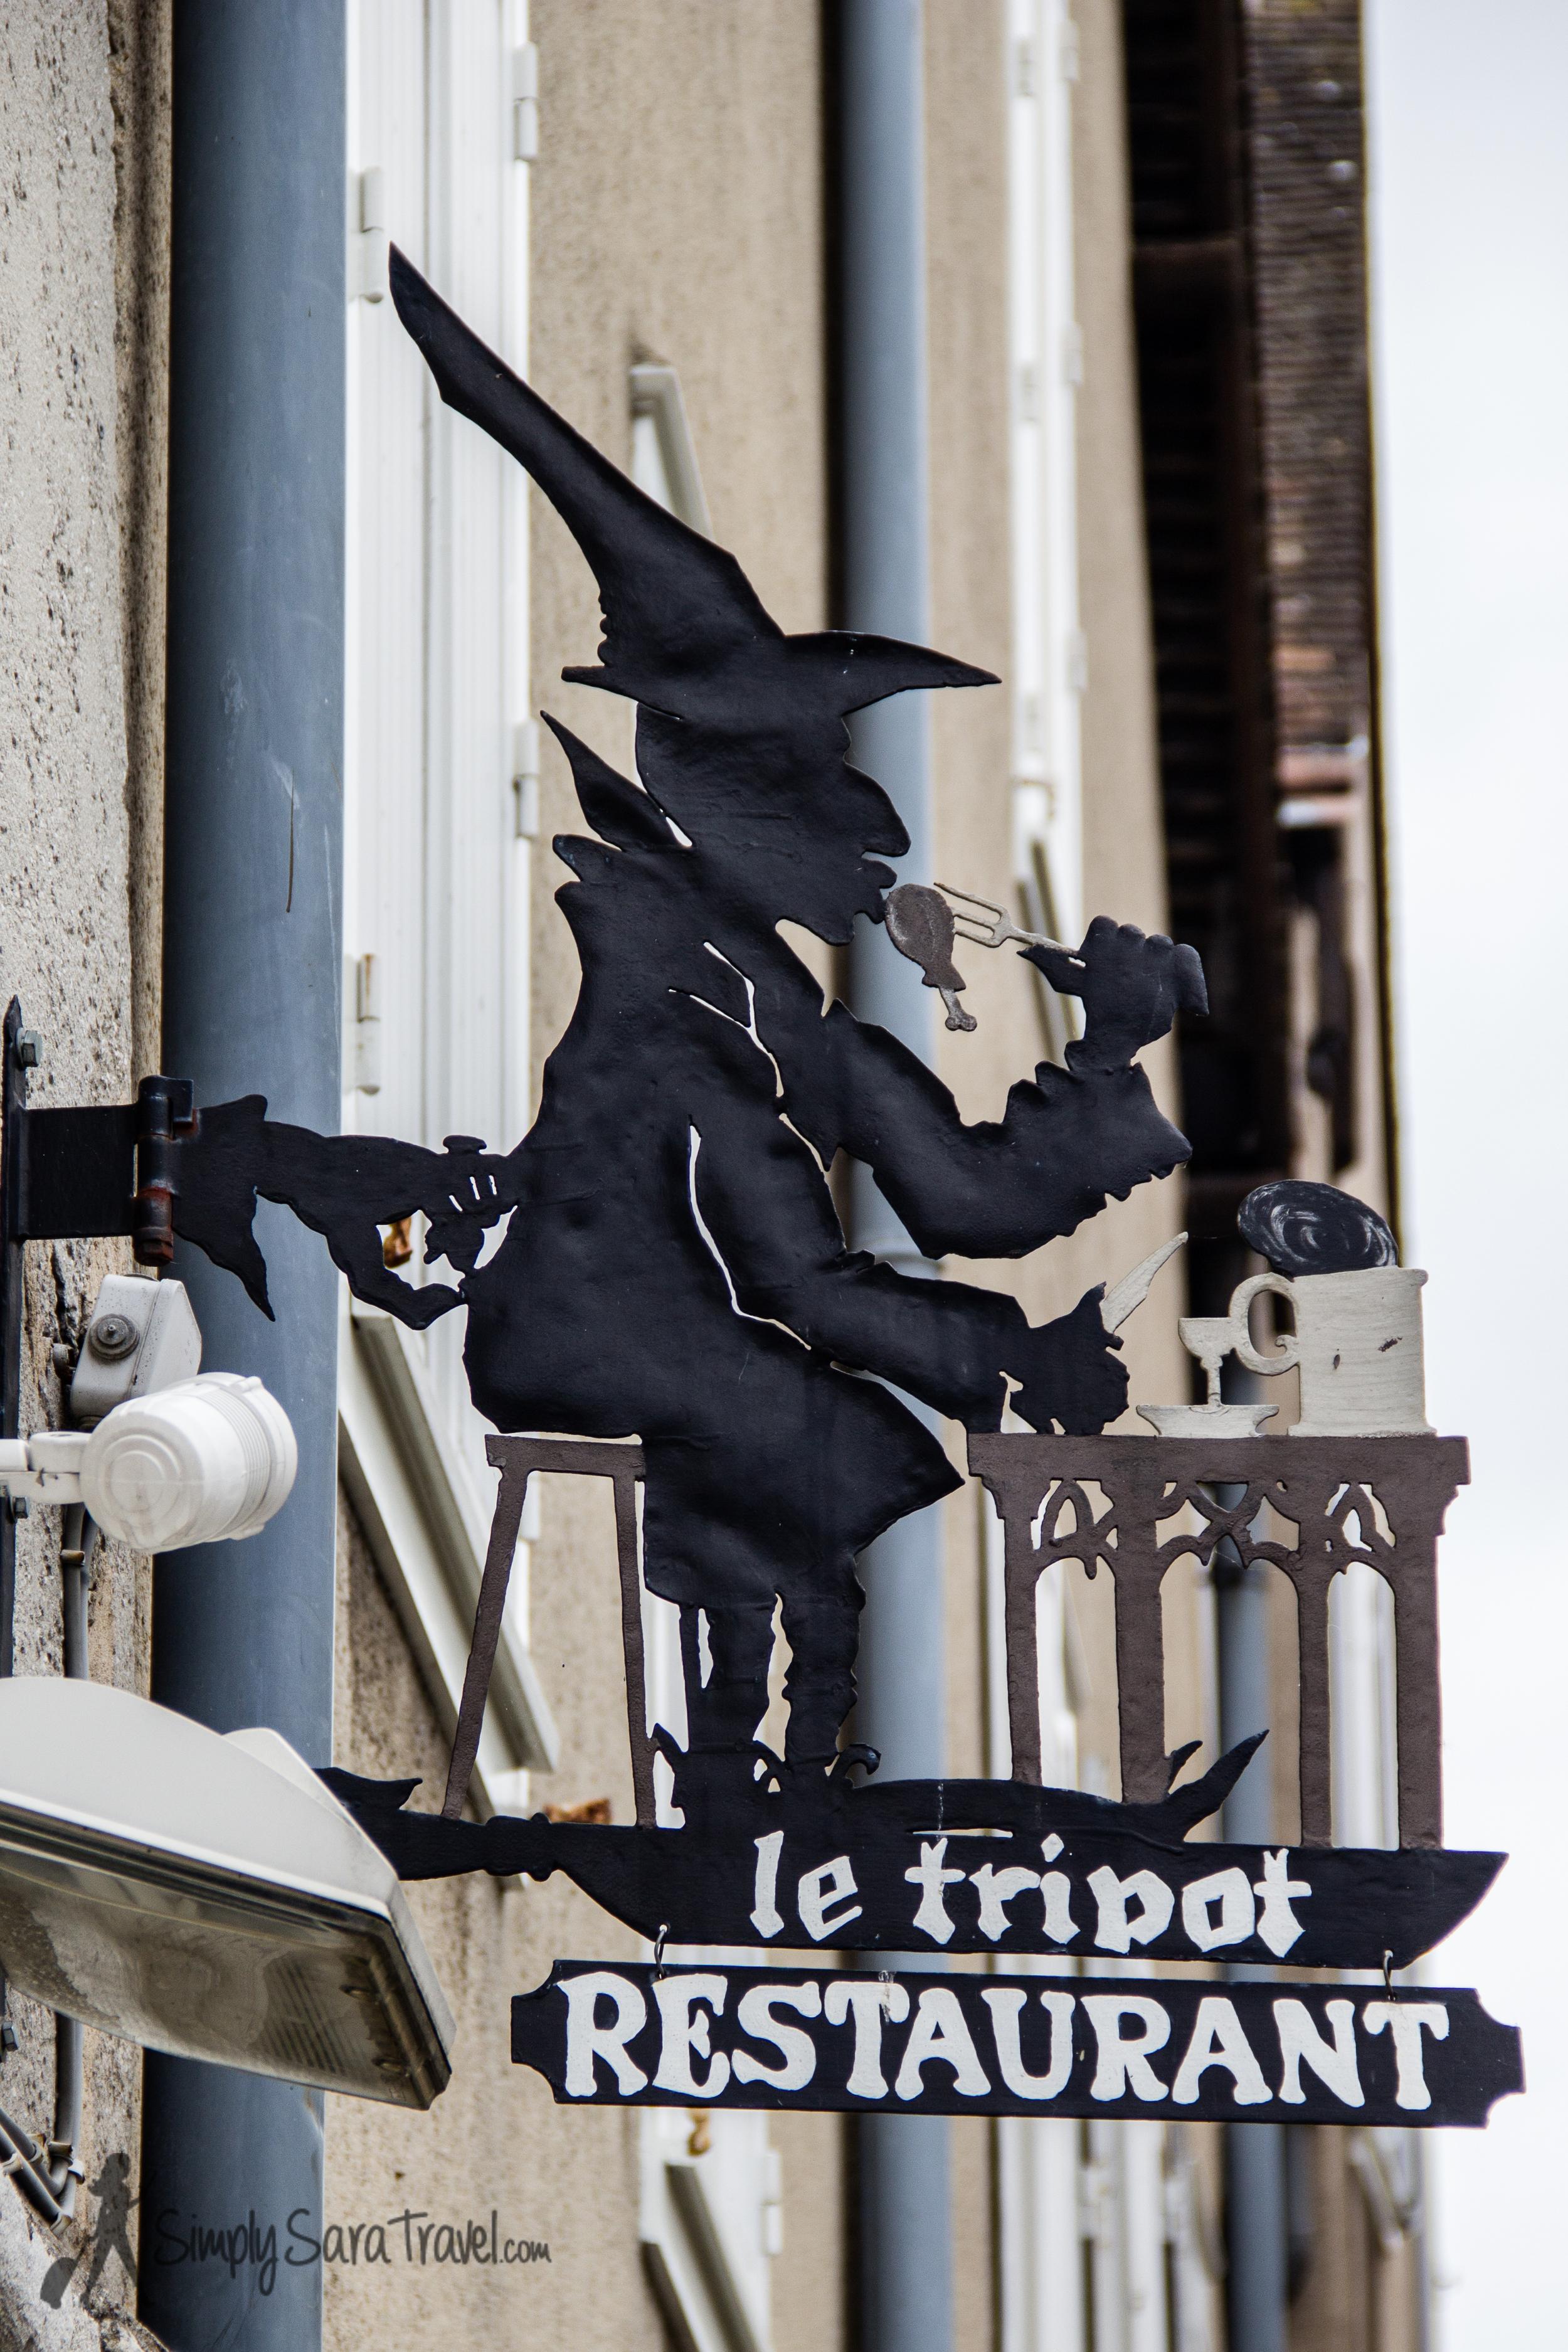 Restaurant Le Tripot, Chartres, France